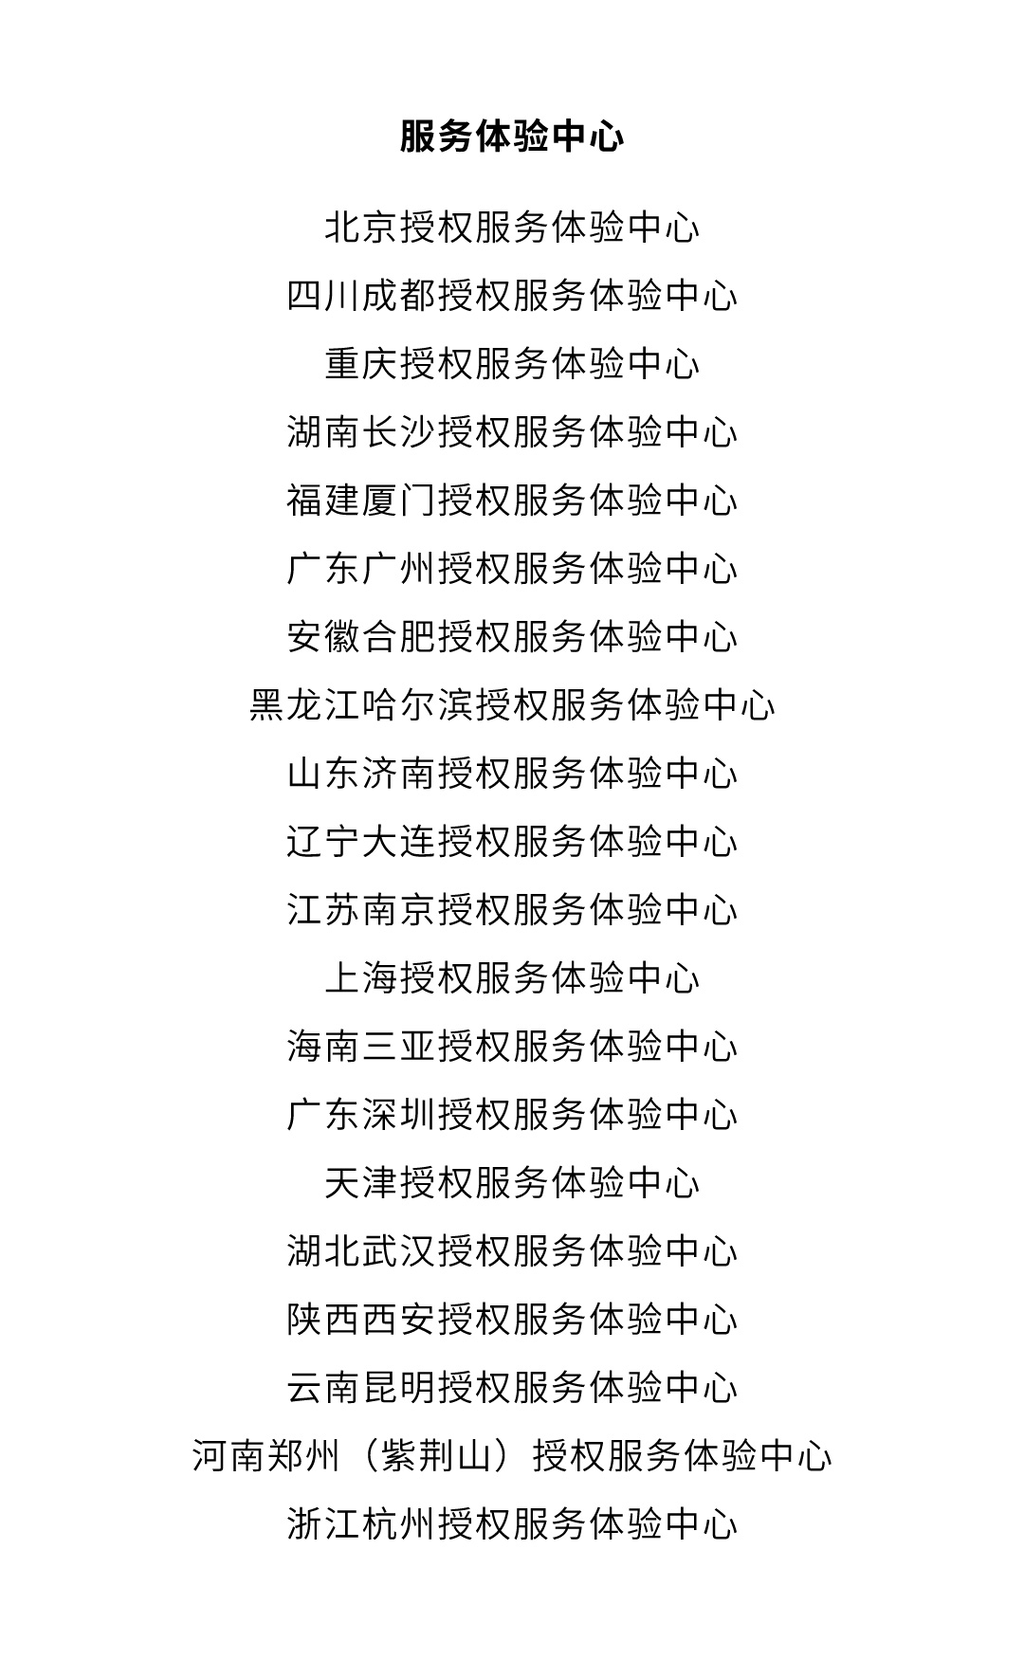 tiyanzhongxin.jpeg